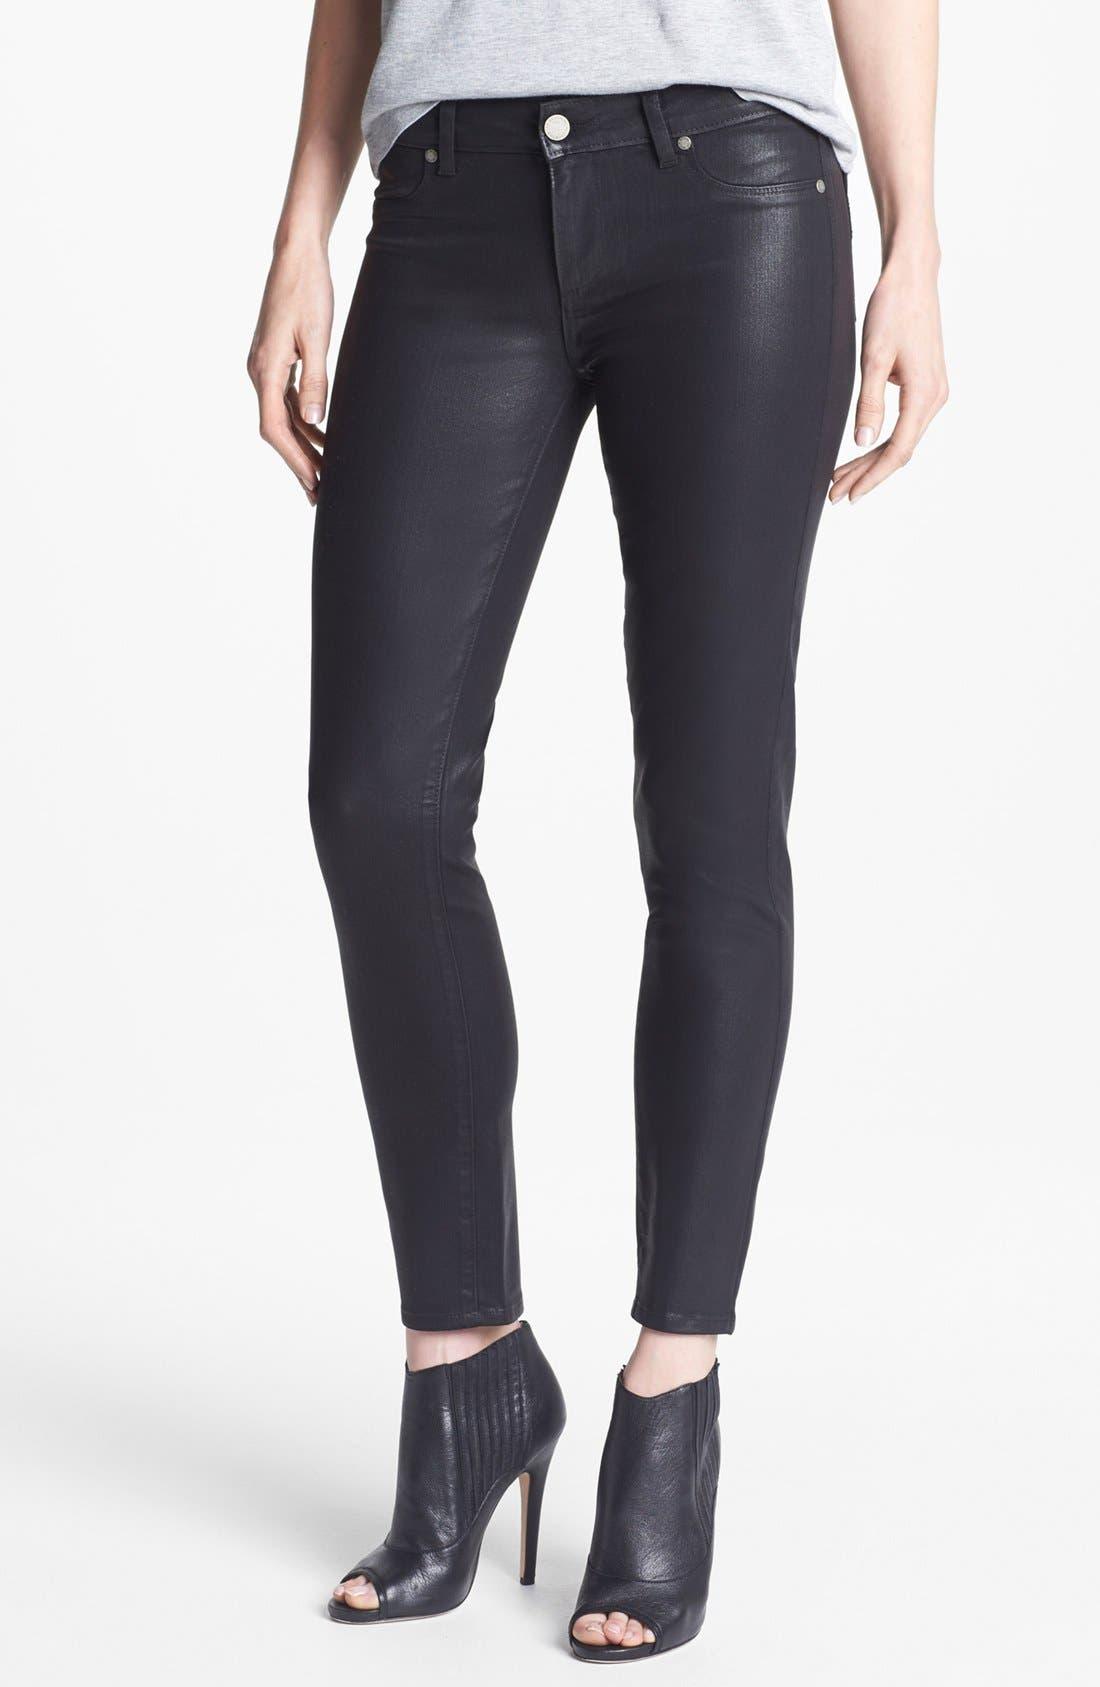 Denim 'Verdugo' Ankle Coated Skinny Jeans,                             Main thumbnail 1, color,                             001